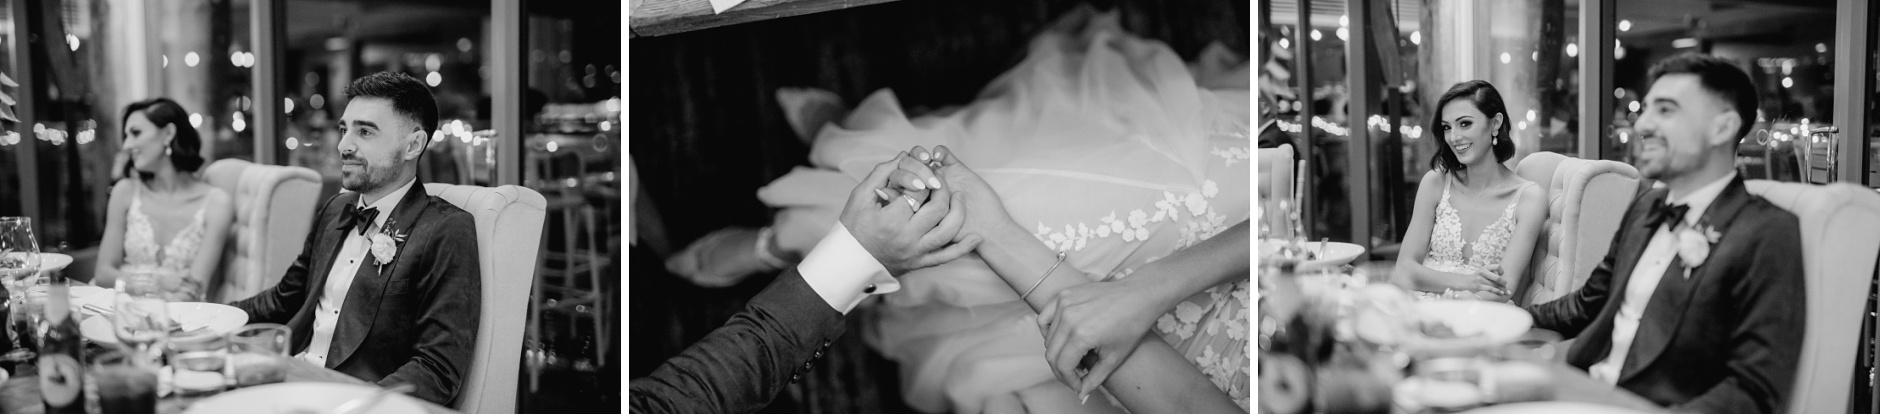 Sydney-Wedding-Photographer_0171.jpg